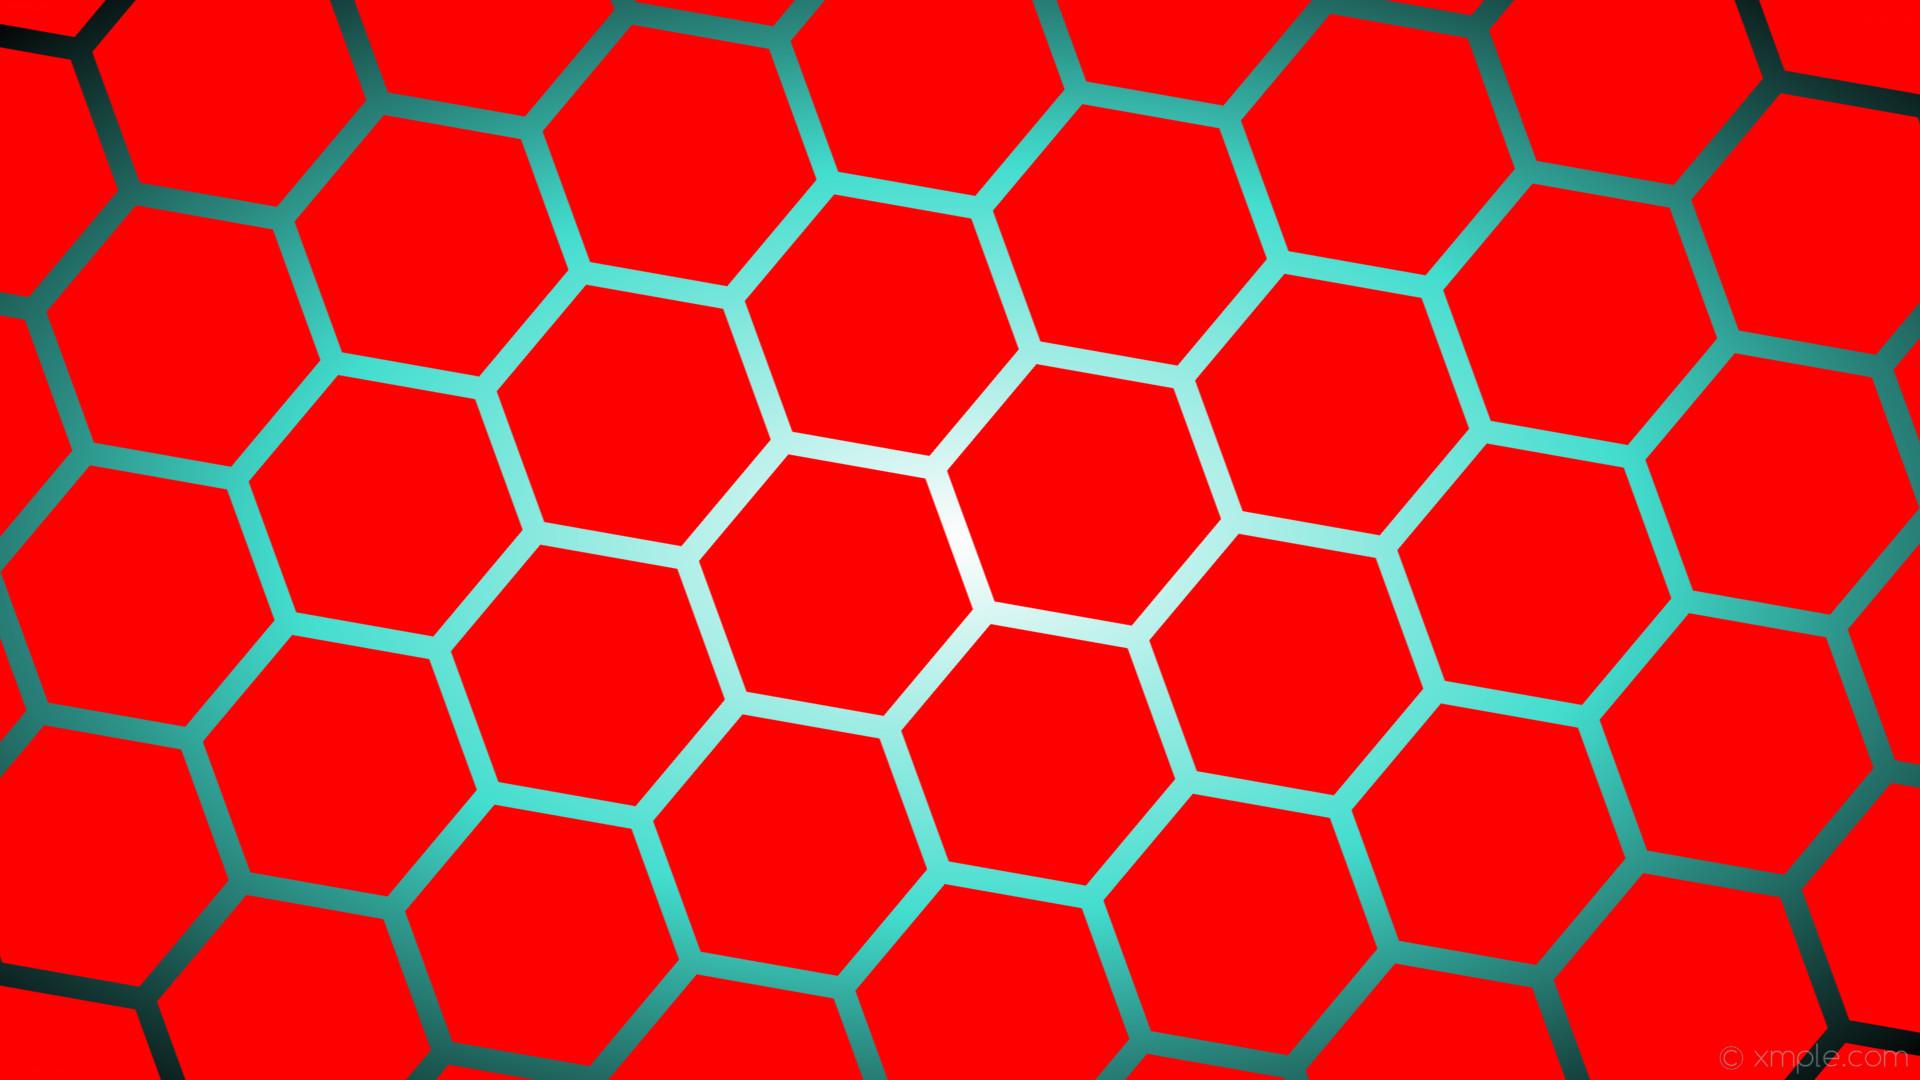 wallpaper black blue red hexagon glow white gradient turquoise #ff0000  #ffffff #40e0d0 diagonal